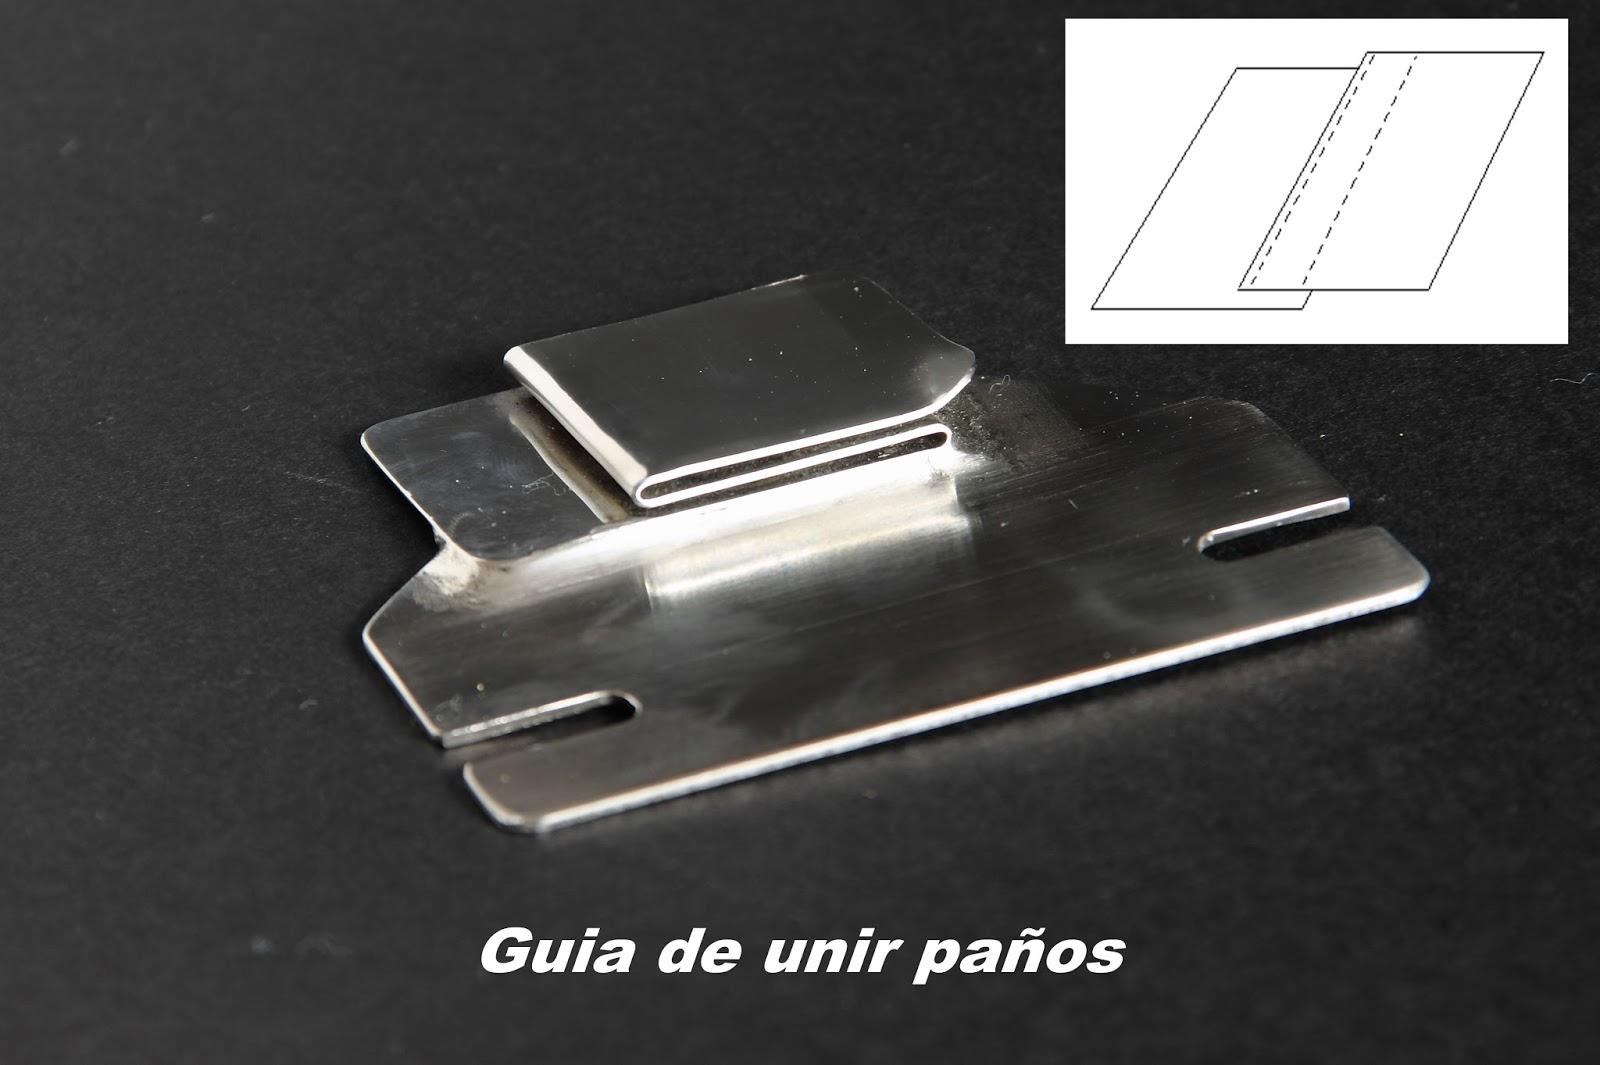 Guias para toldos perfect patio de gua with guias para for Guias de aluminio para toldos